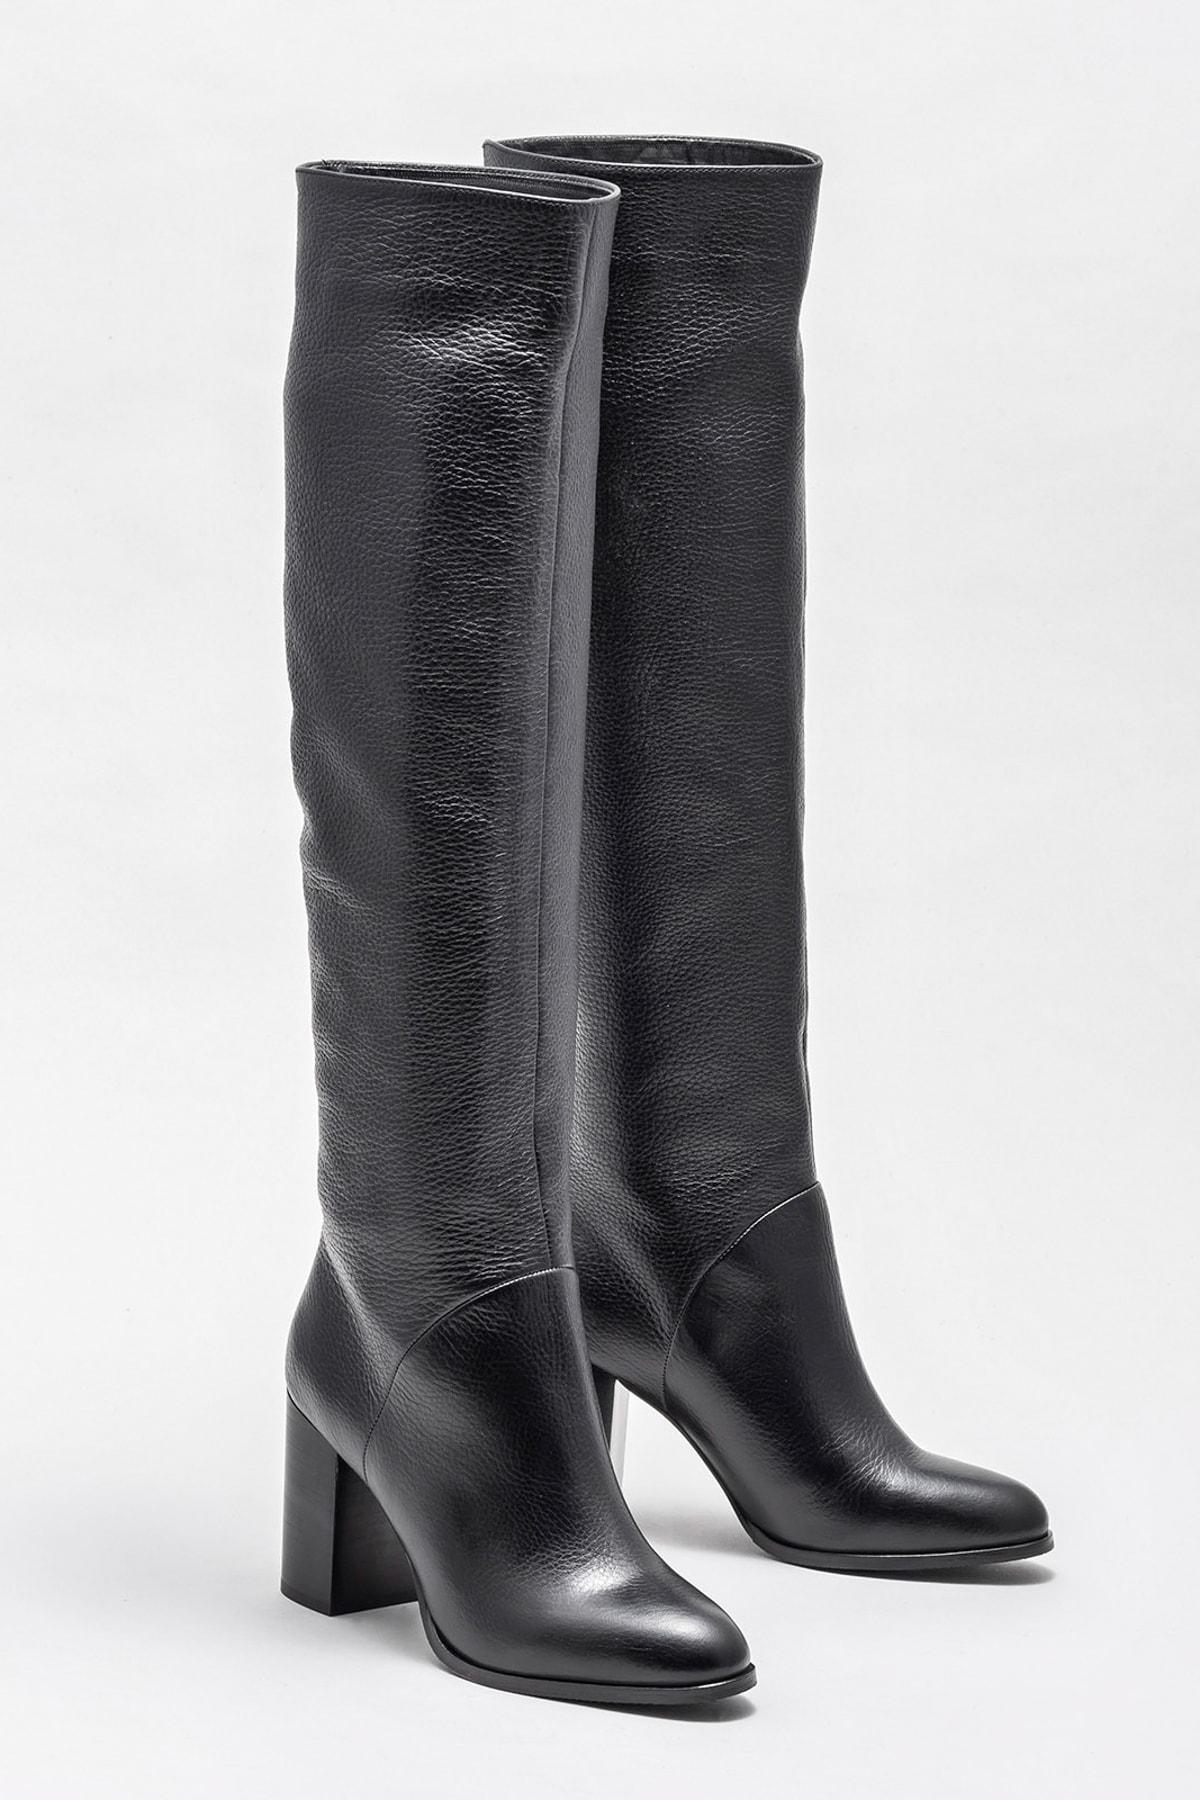 Elle Shoes Kadın RANSEYS Çizme 20KTO18412 1